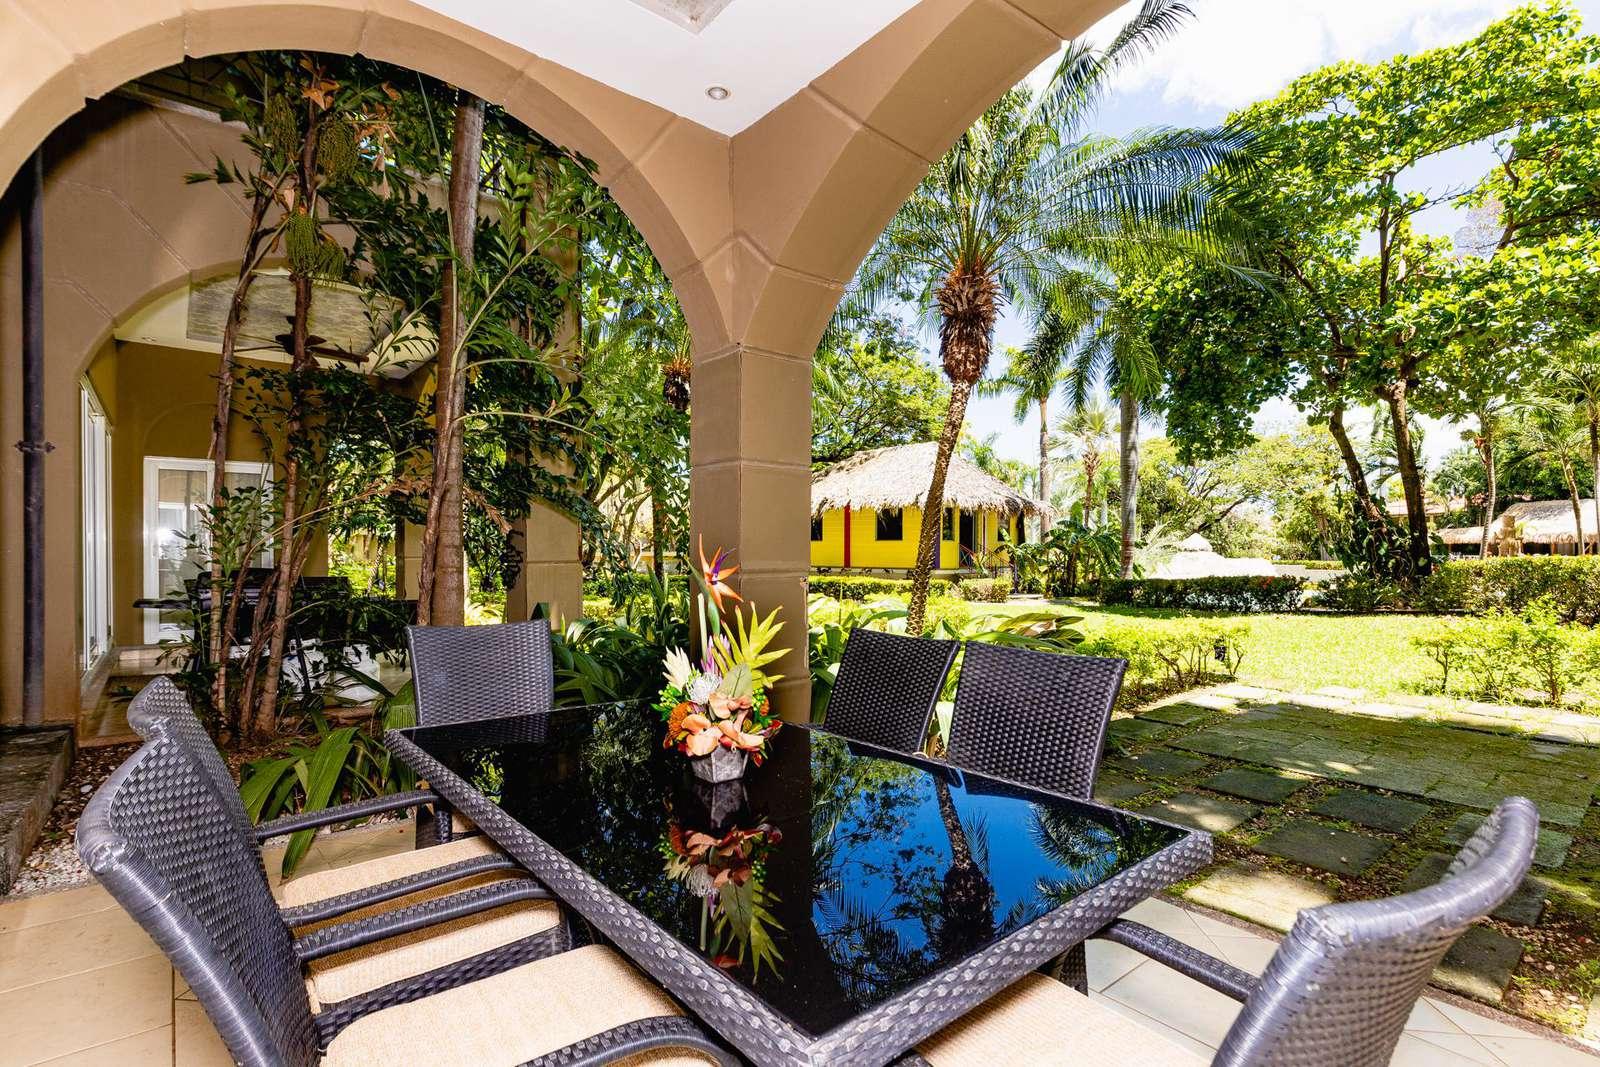 Matapalo 104, a poolside condo at the Diria Resort